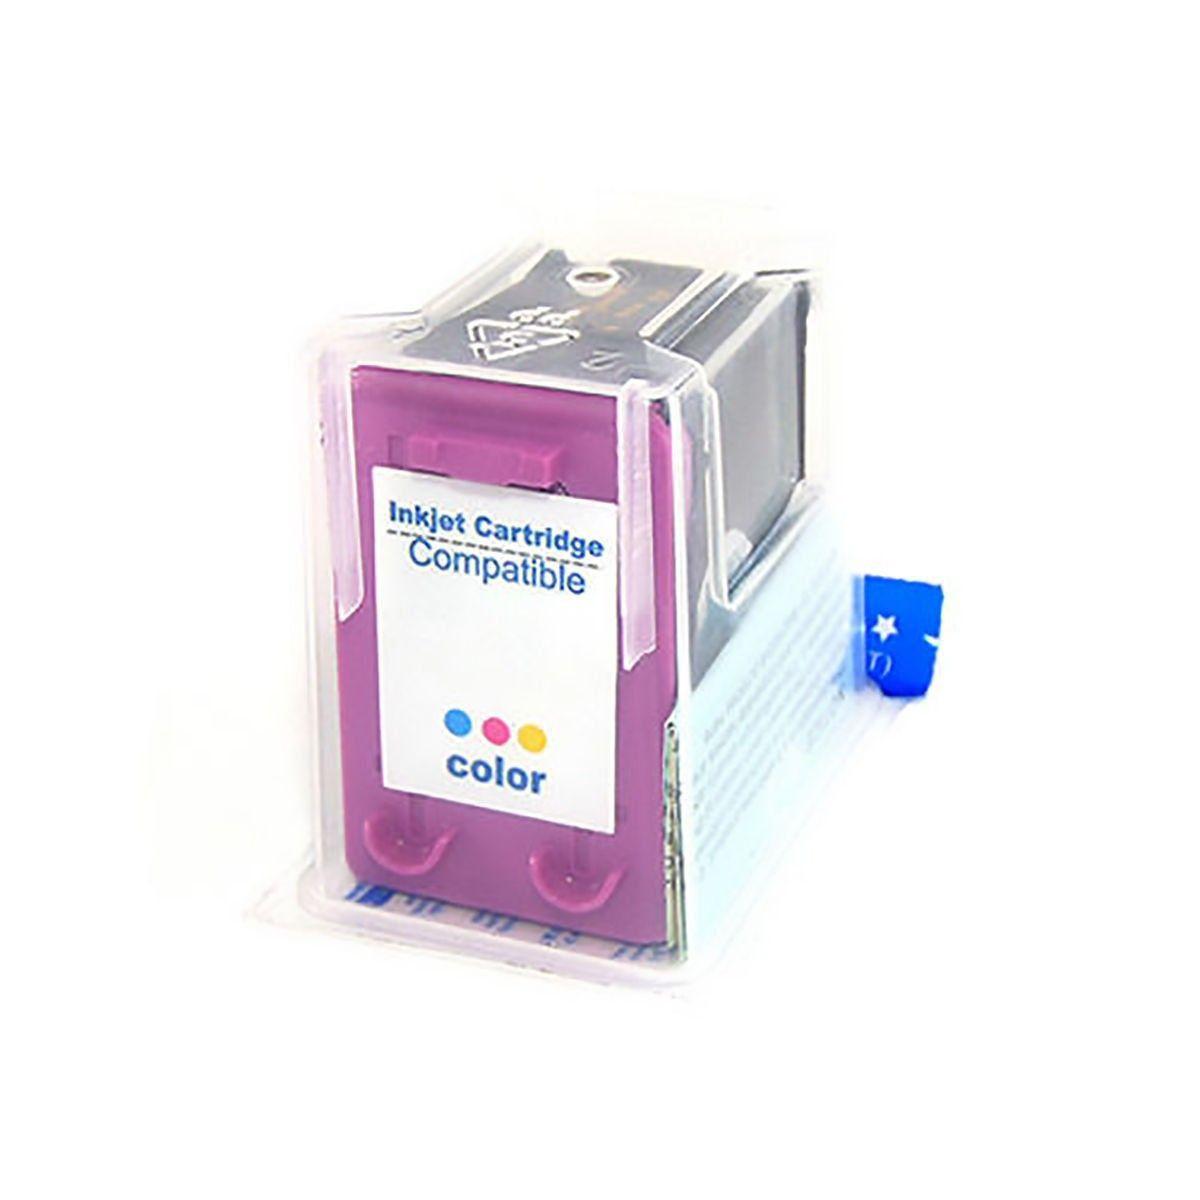 Compatível: Cartucho de Tinta 61xl 61 para HP 1050 J410a J410e 1000 J110a 1051 1010 2000 2050 2540 / Colorido / 13ml